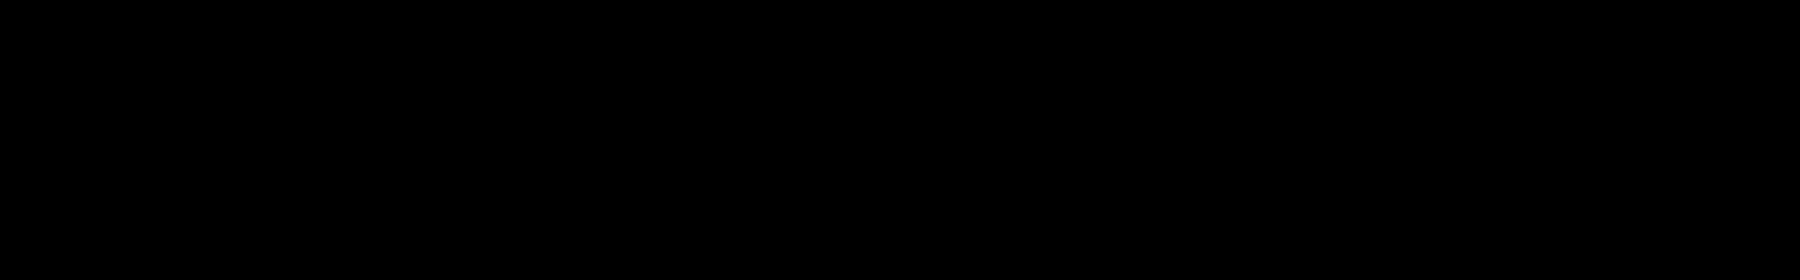 Relic - Ambient Loops audio waveform